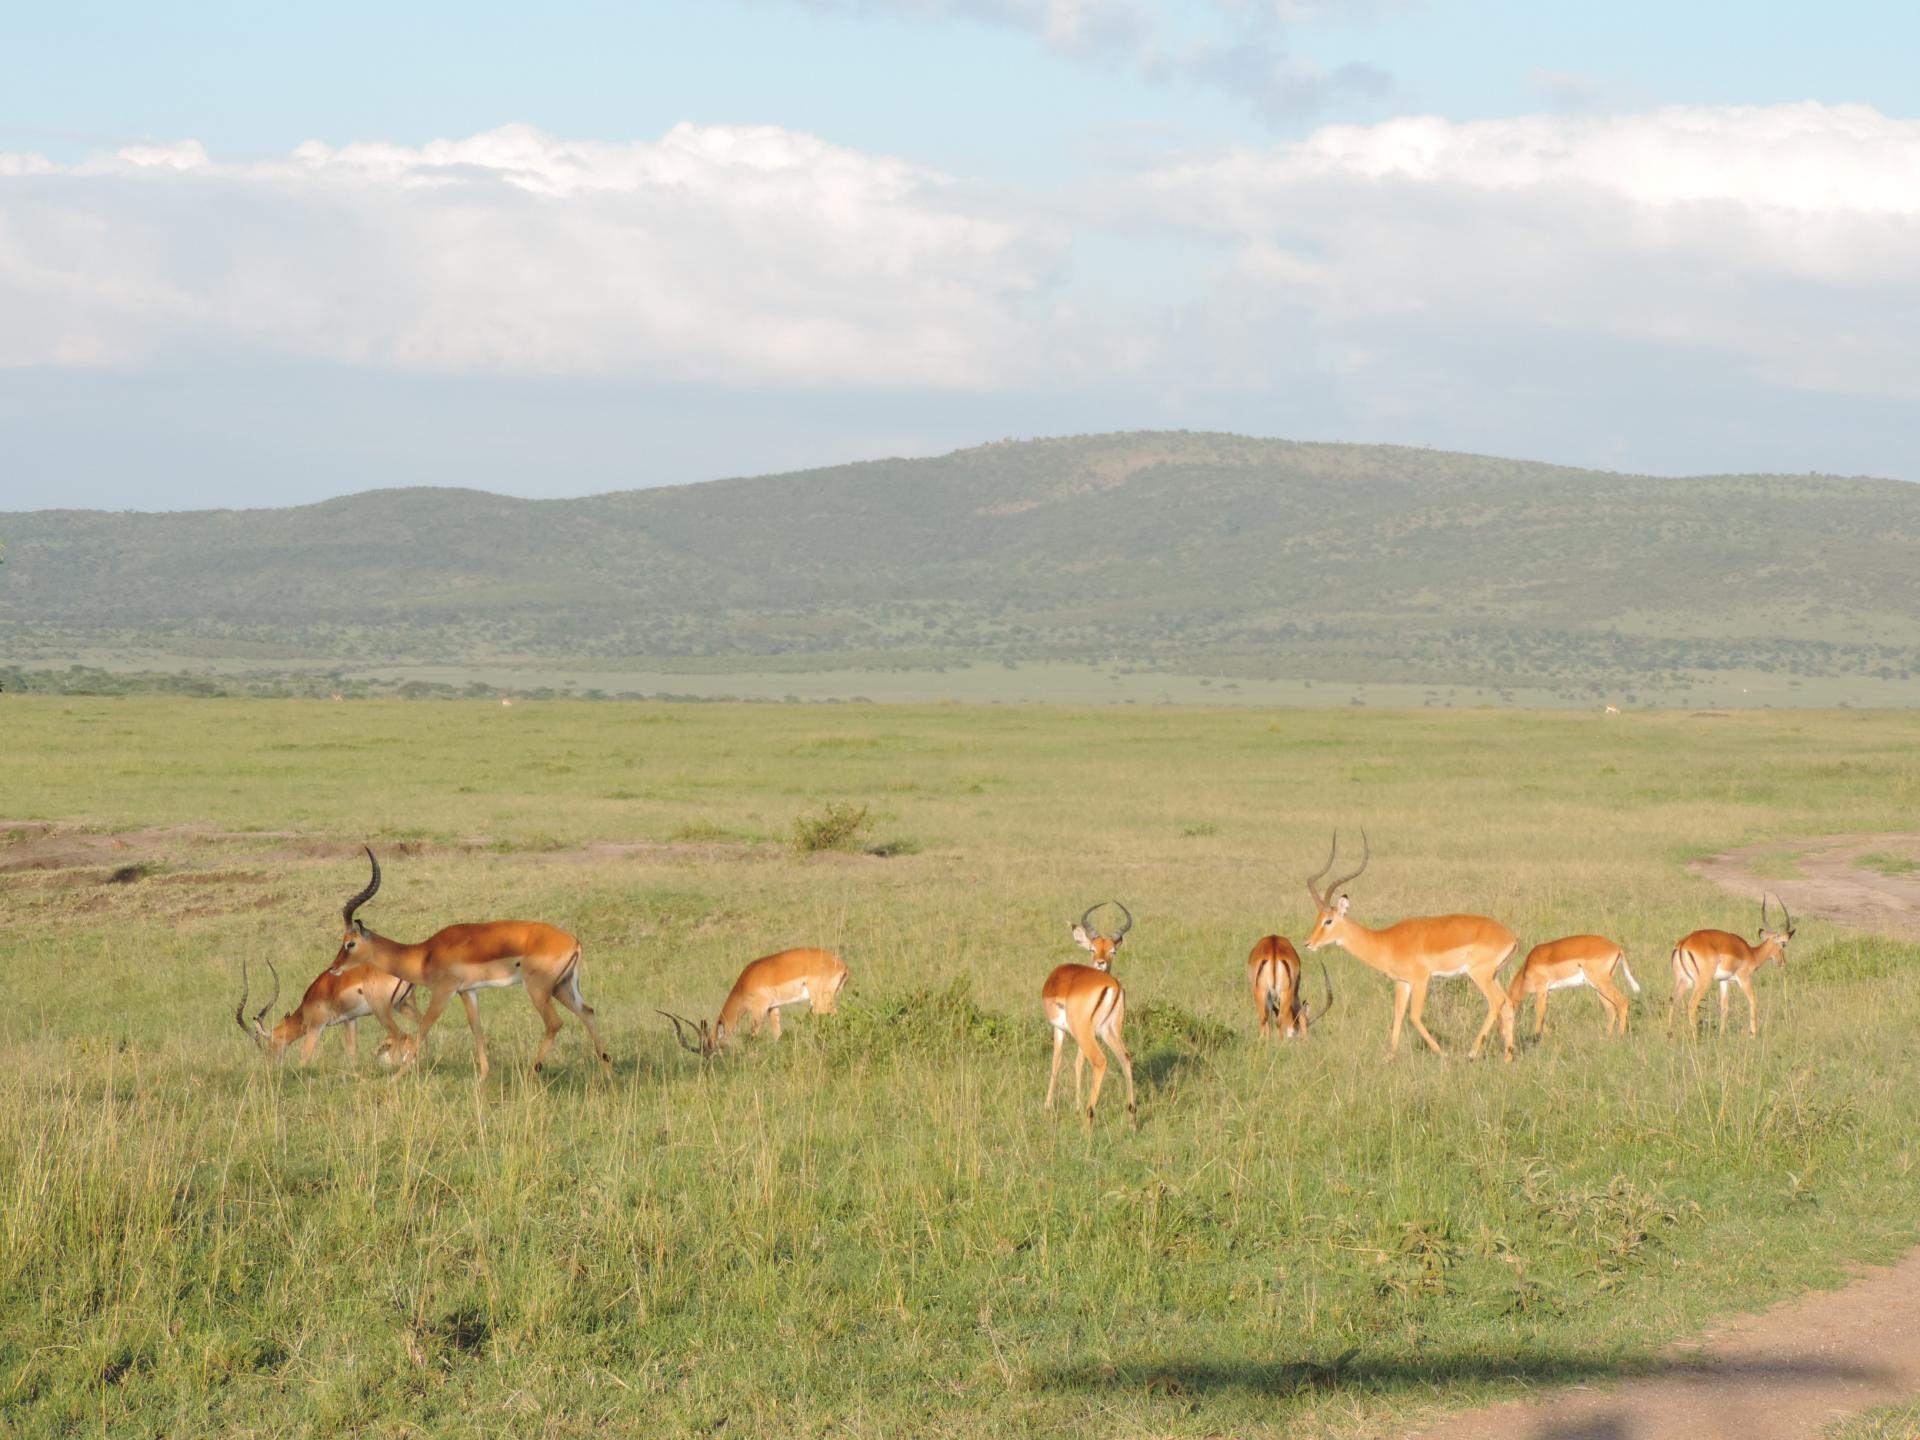 Masai Mara National Game Reserve